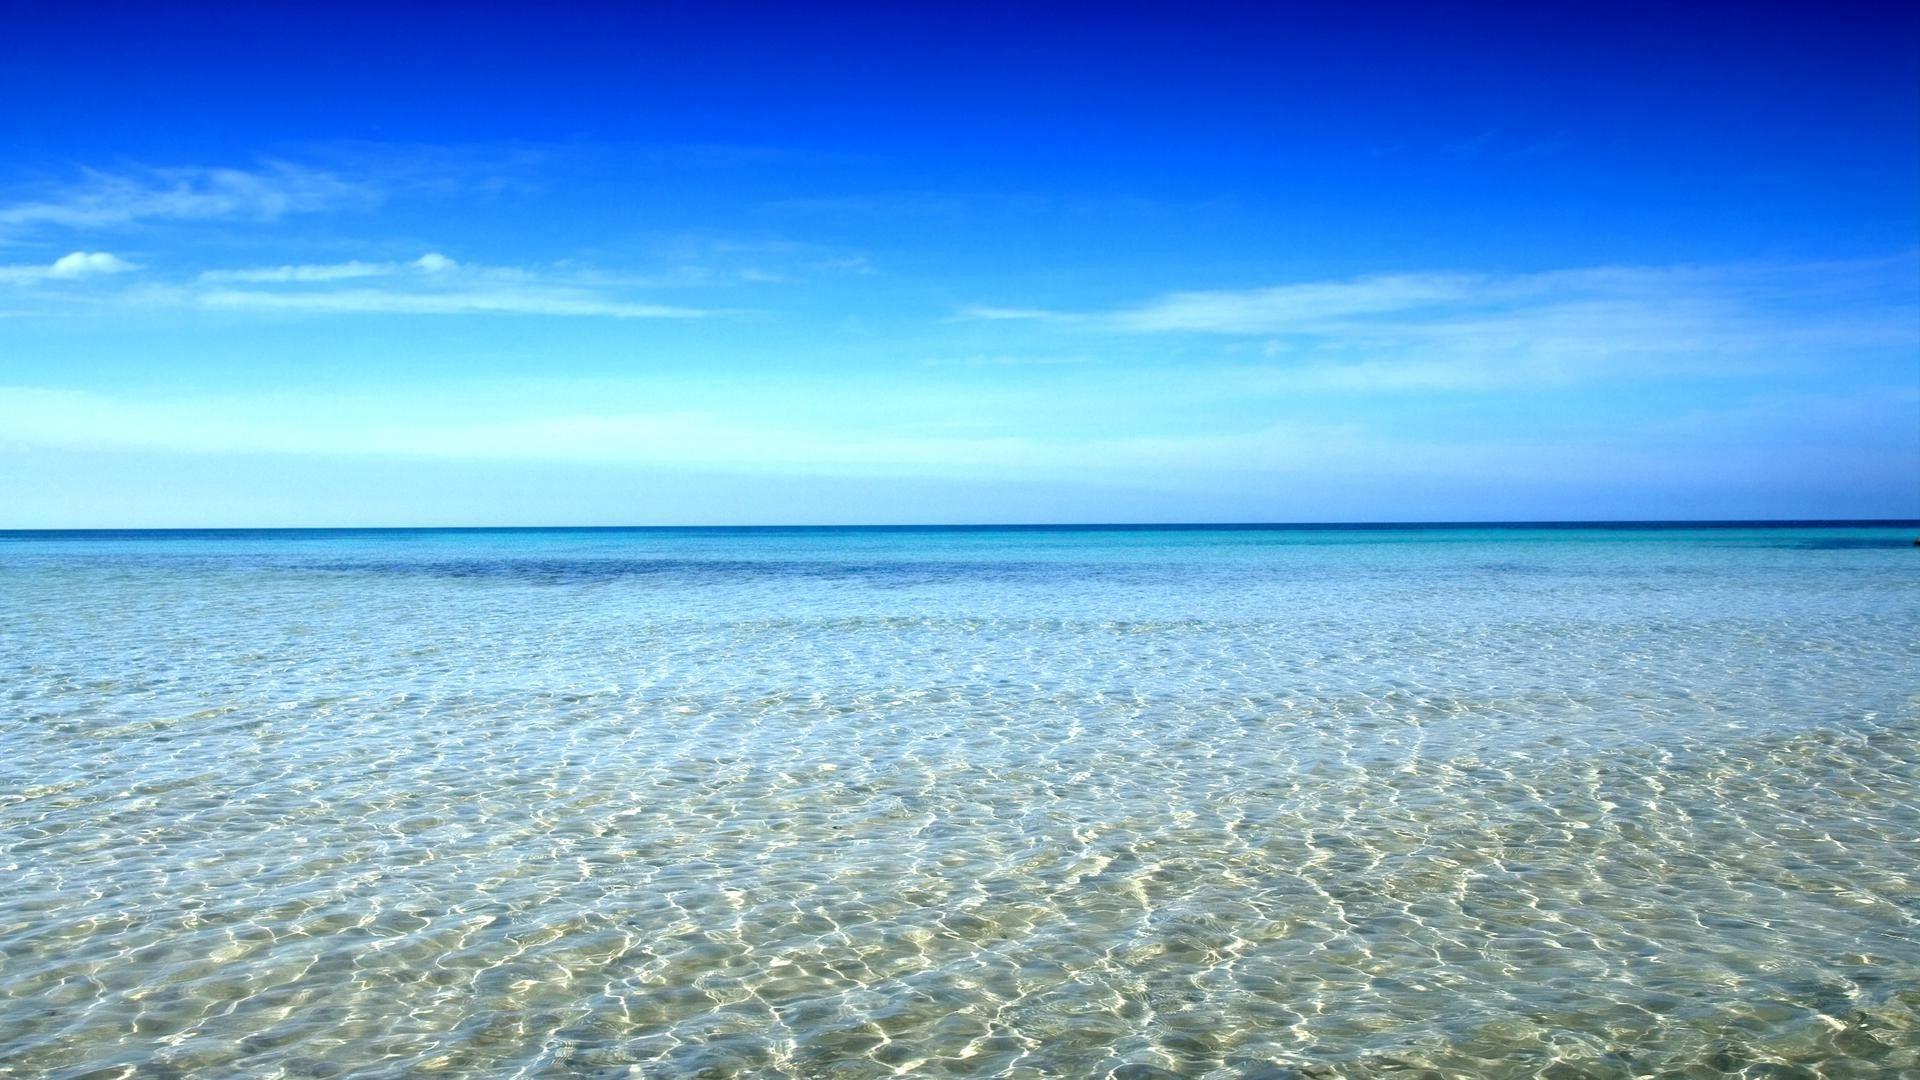 Free Backrounds ocean backgrounds, free hd ocean backgrounds, #32123